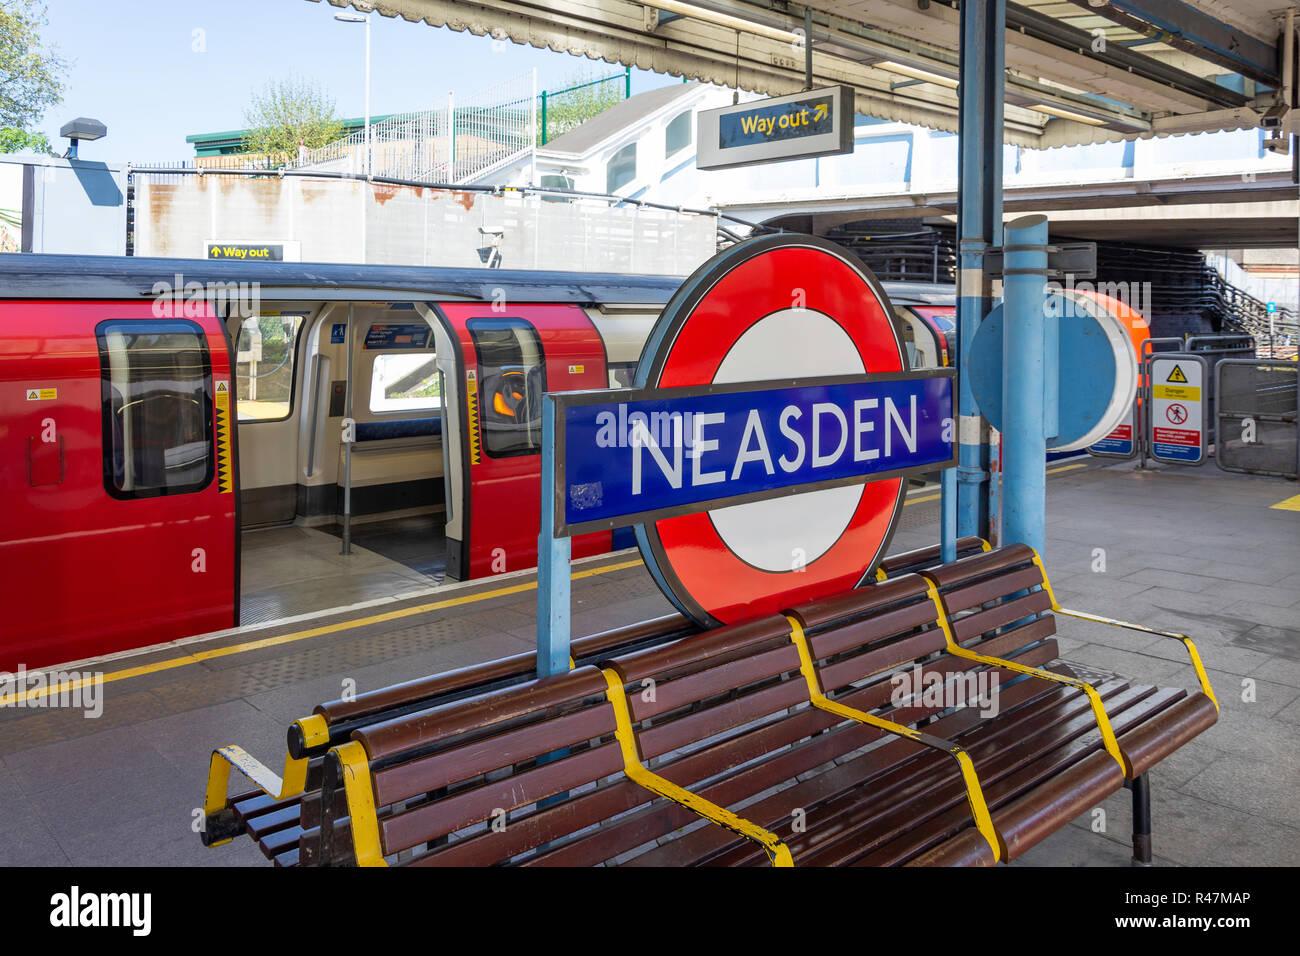 Platform at Neasden Underground Station, Neasden, London Borough of Brent, Greater London, England, United Kingdom - Stock Image